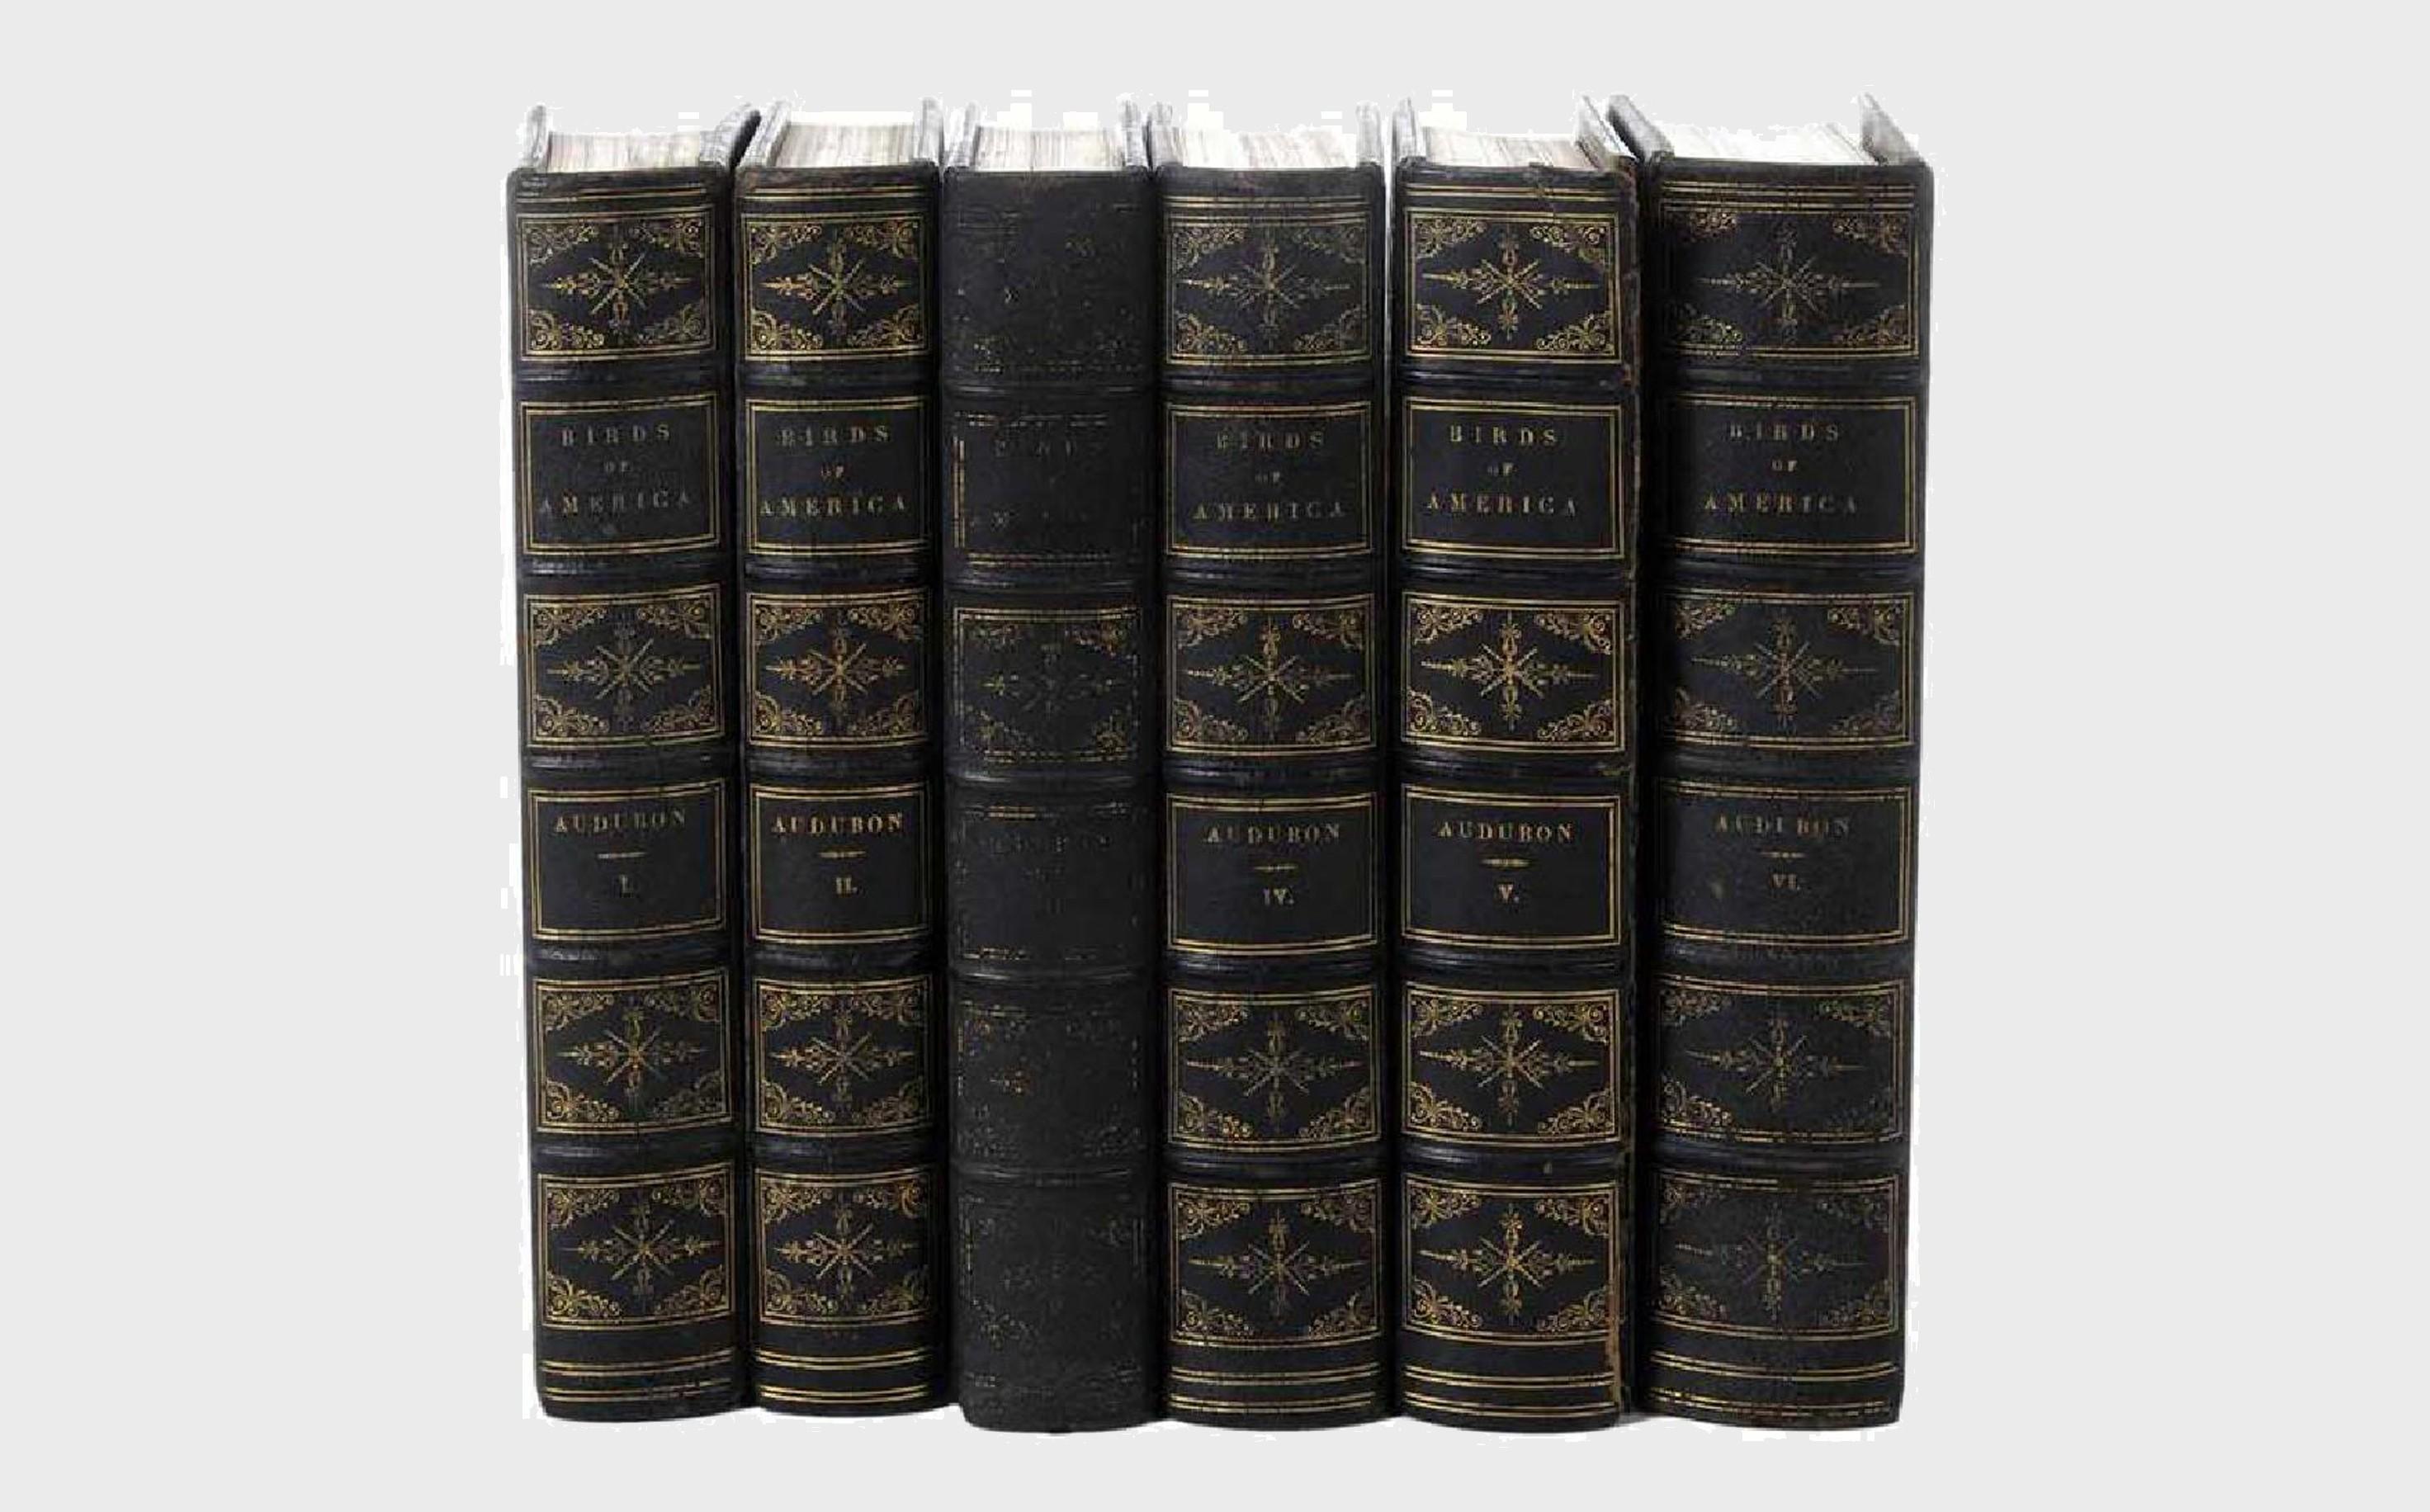 Audubon, Birds of America, Six Volumes